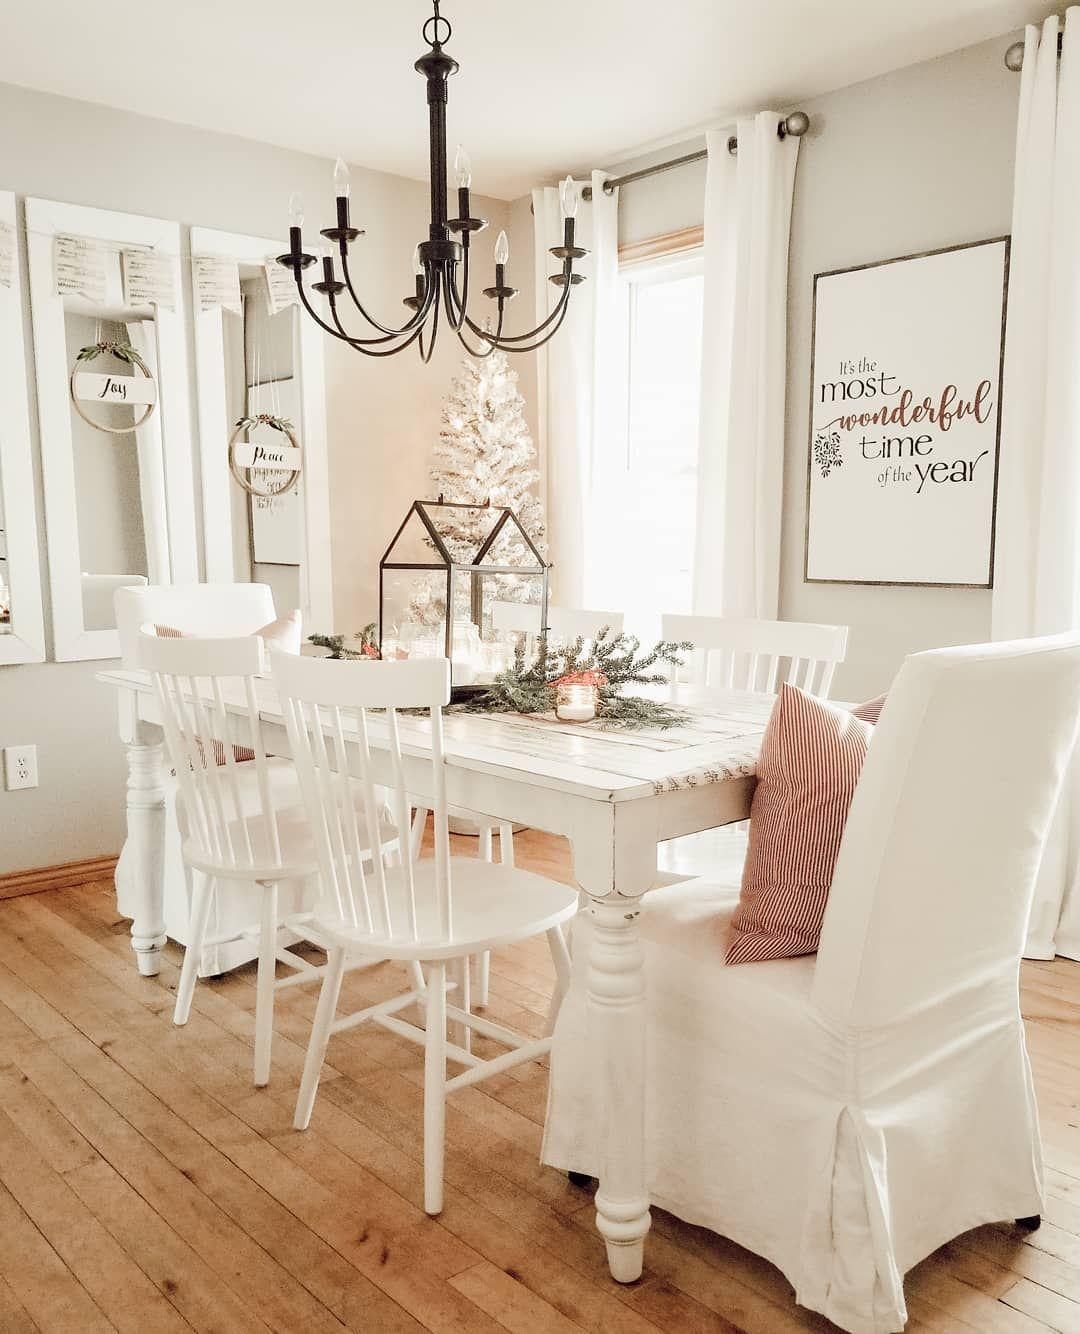 White Christmas Dining Room Decor @farmhouse165 #ChristmasDecor #ChristmasDiningRoom